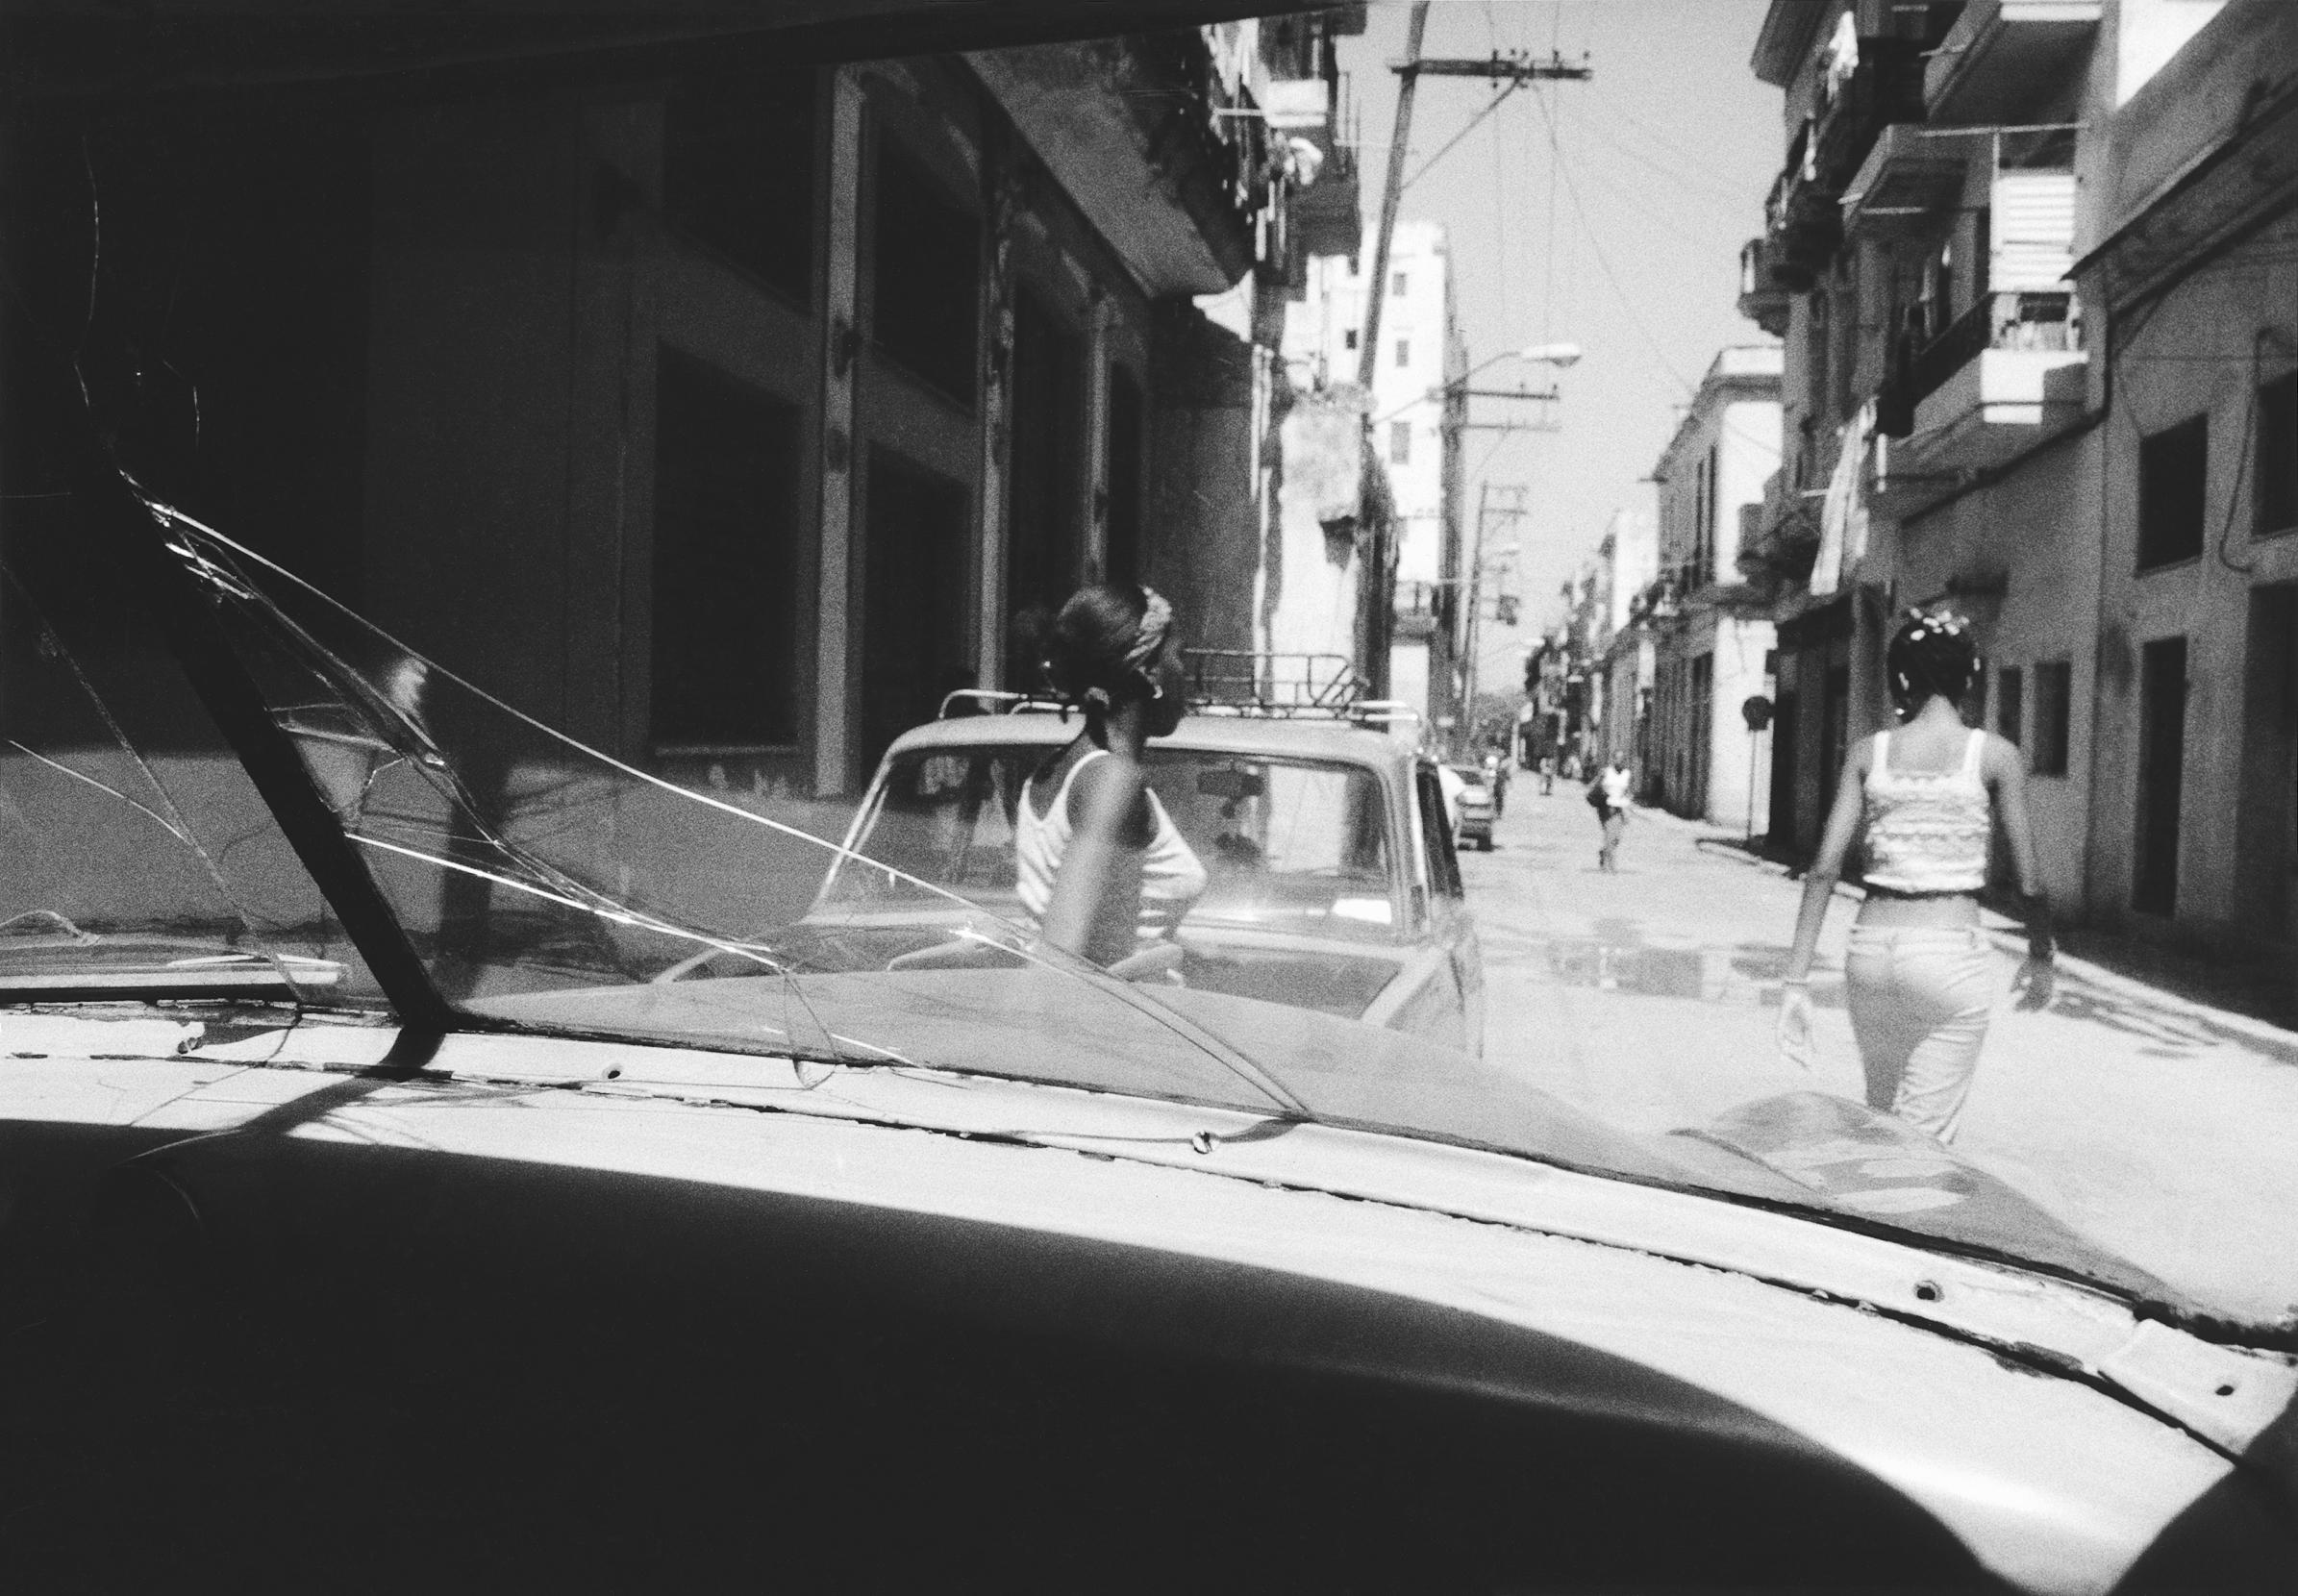 Havana, Cuba 2002